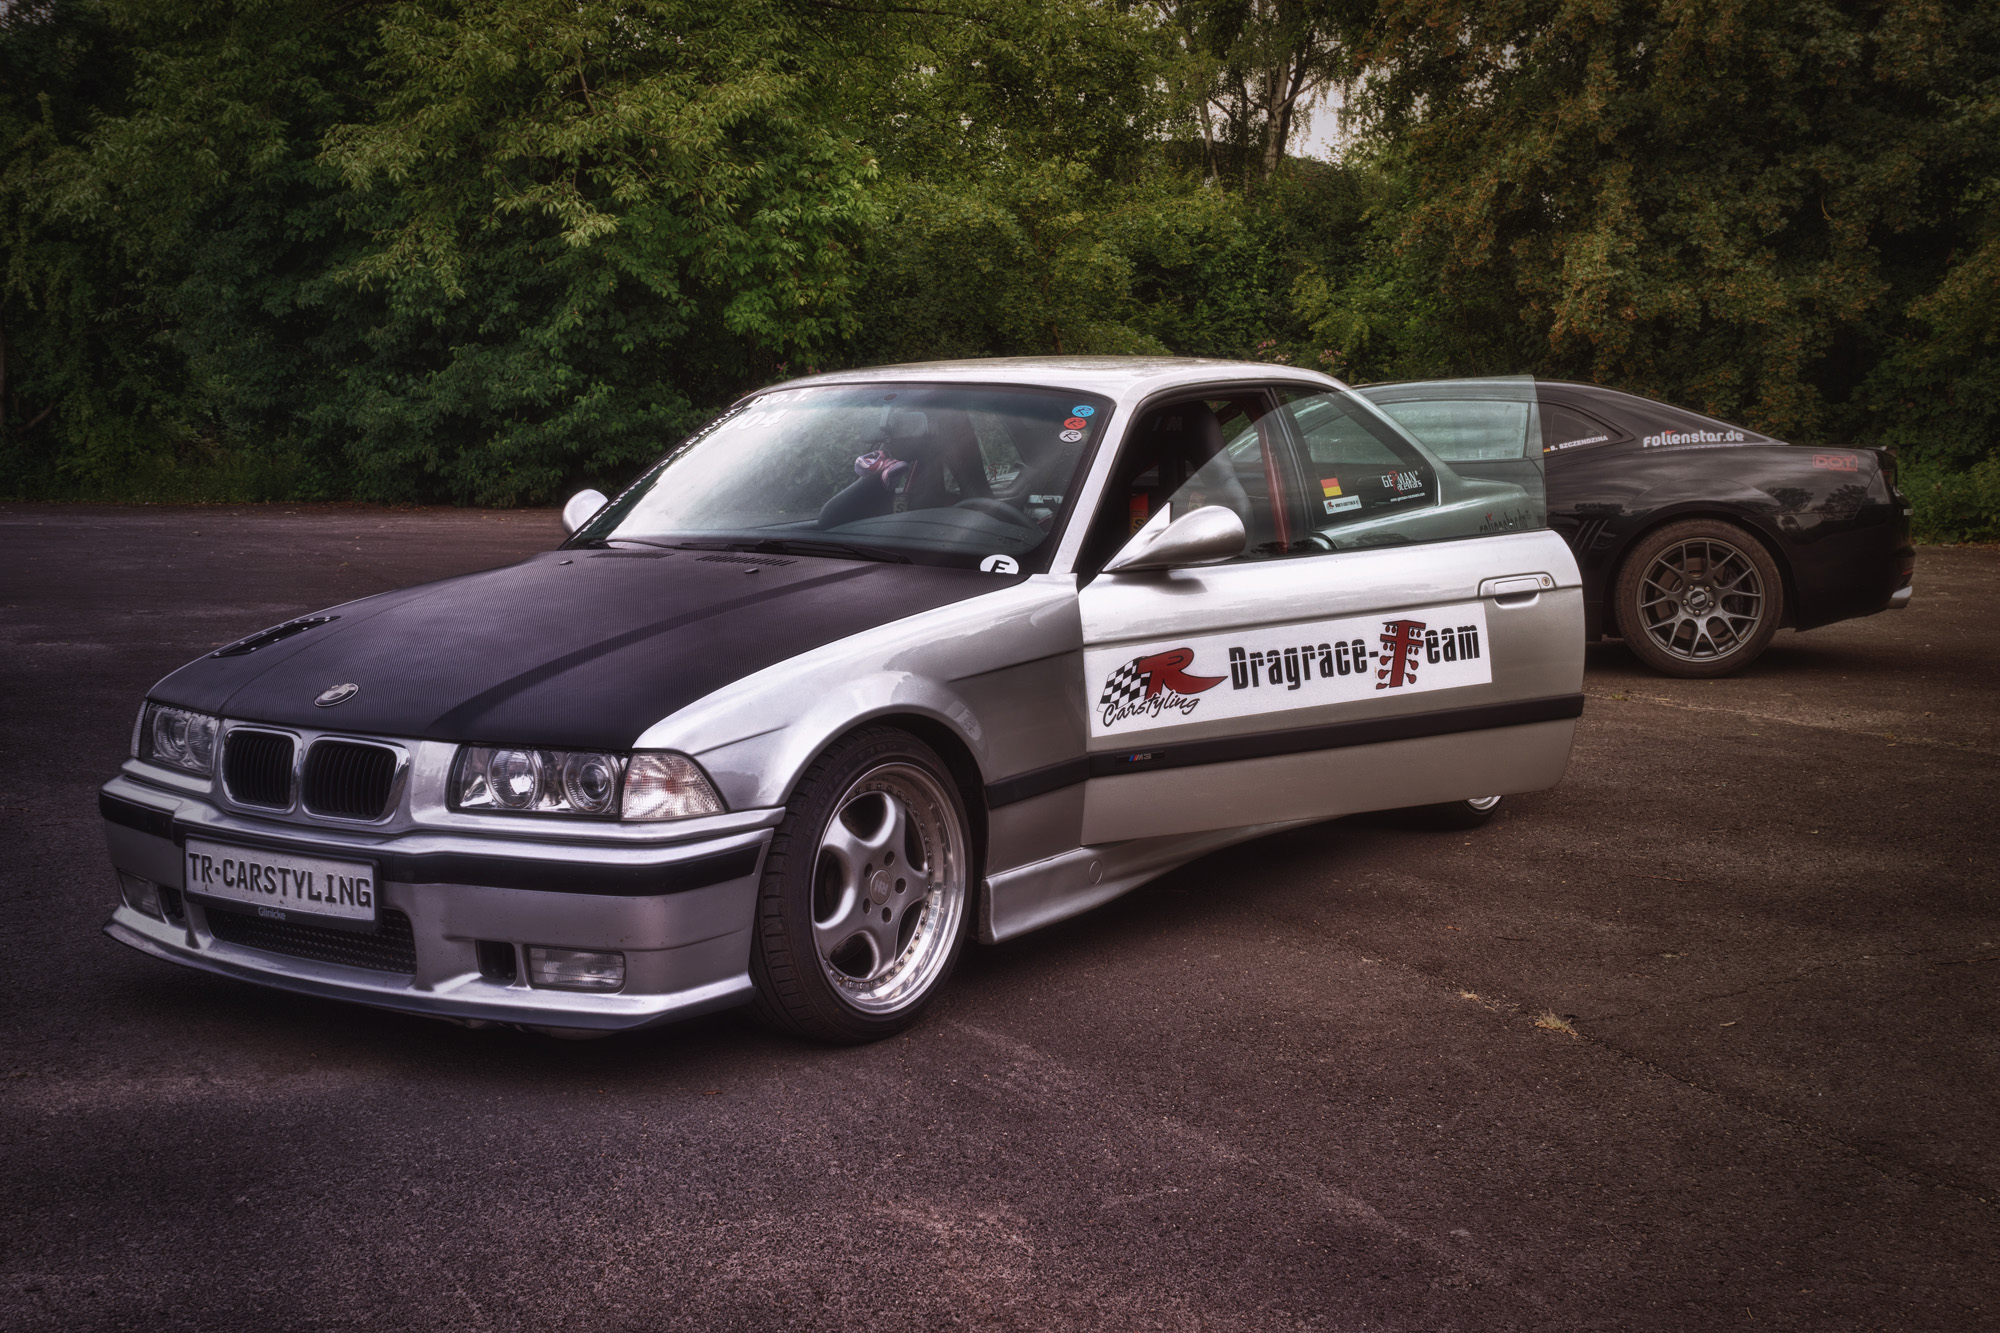 bmw-m3-e36-turbo-tr-carstyling-01